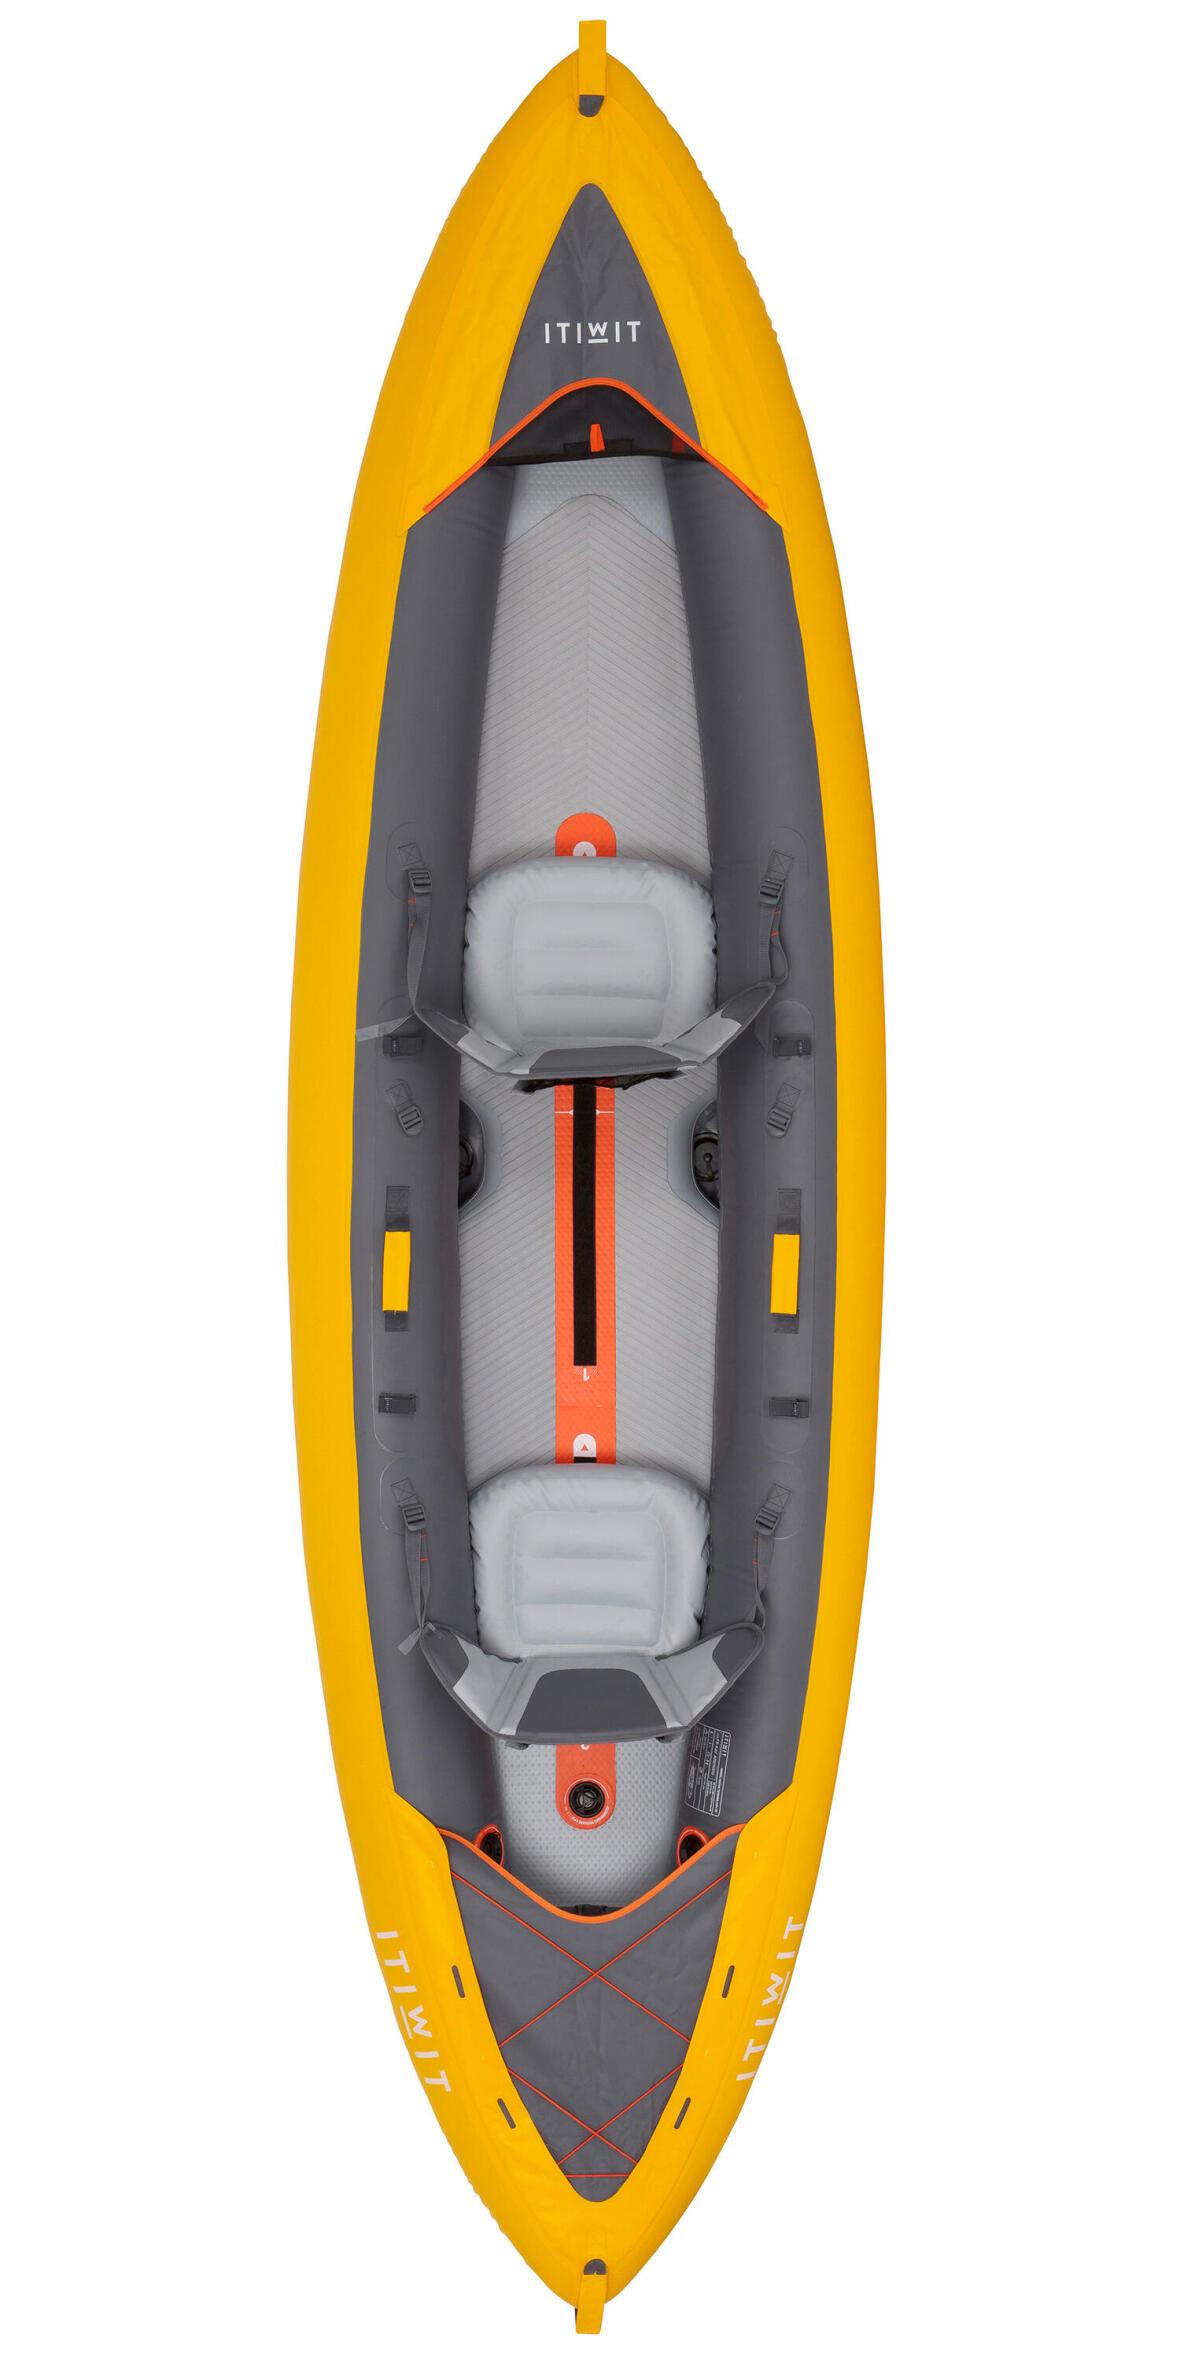 kayak_gonflable_randonnee-fond-hp-droptstitch-2-places-itiwit-jaune-decathlon